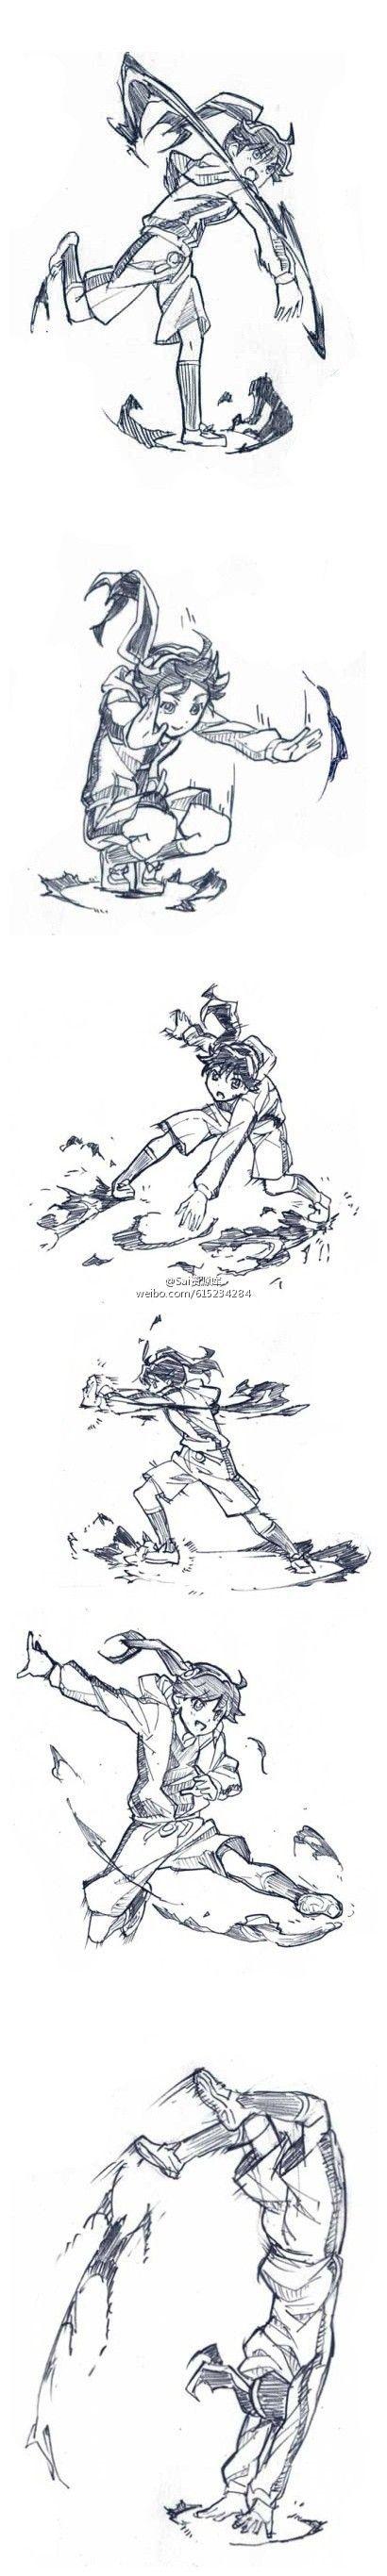 Poses Staff Fighting Anime